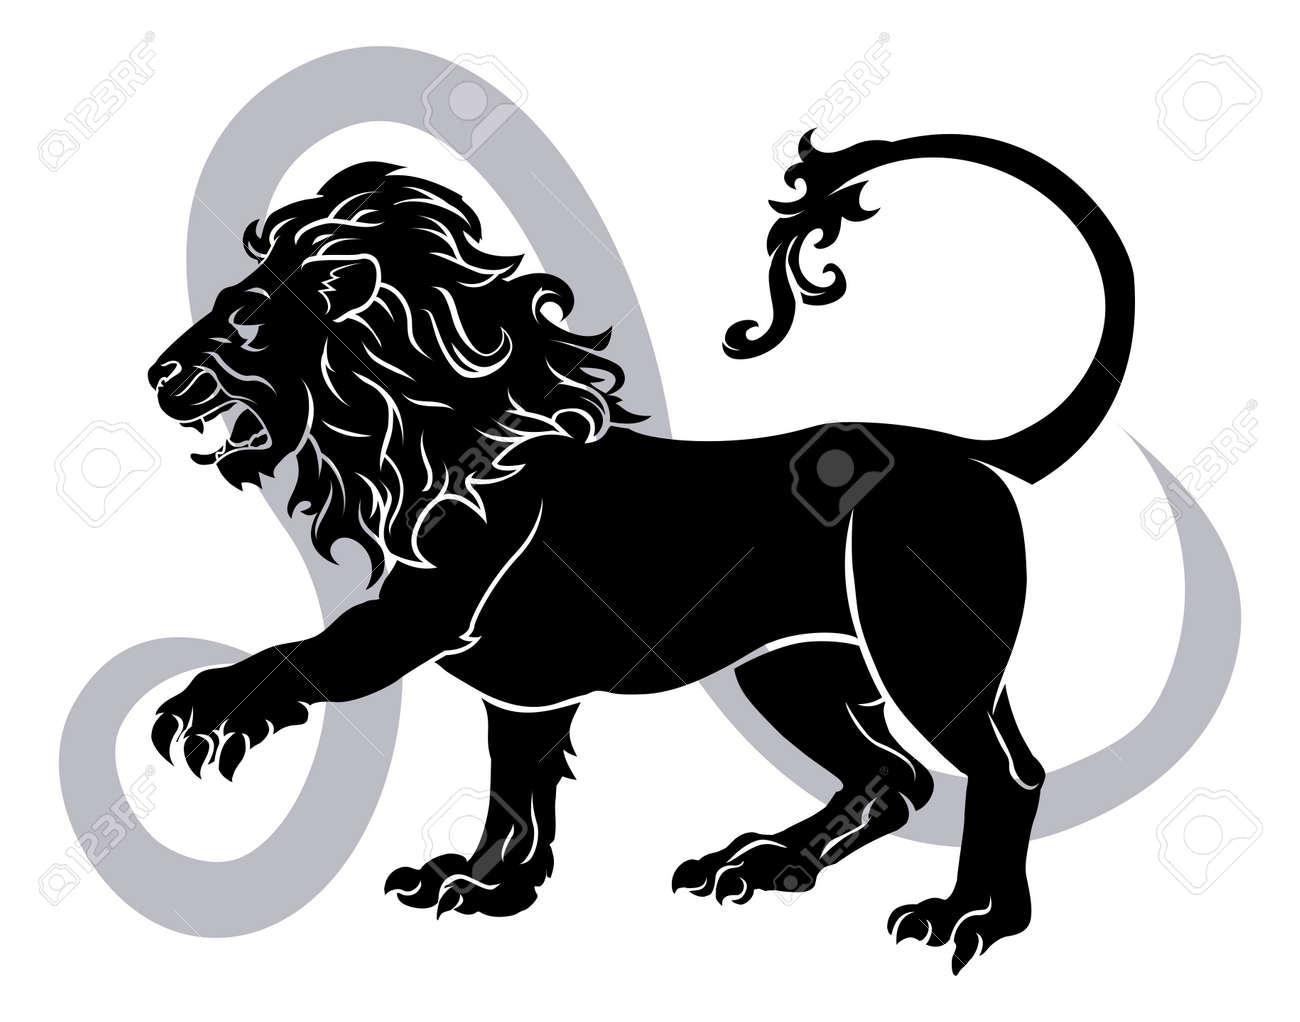 Leo the lion zodiac horoscope astrology sign royalty free cliparts leo the lion zodiac horoscope astrology sign stock vector 17819174 biocorpaavc